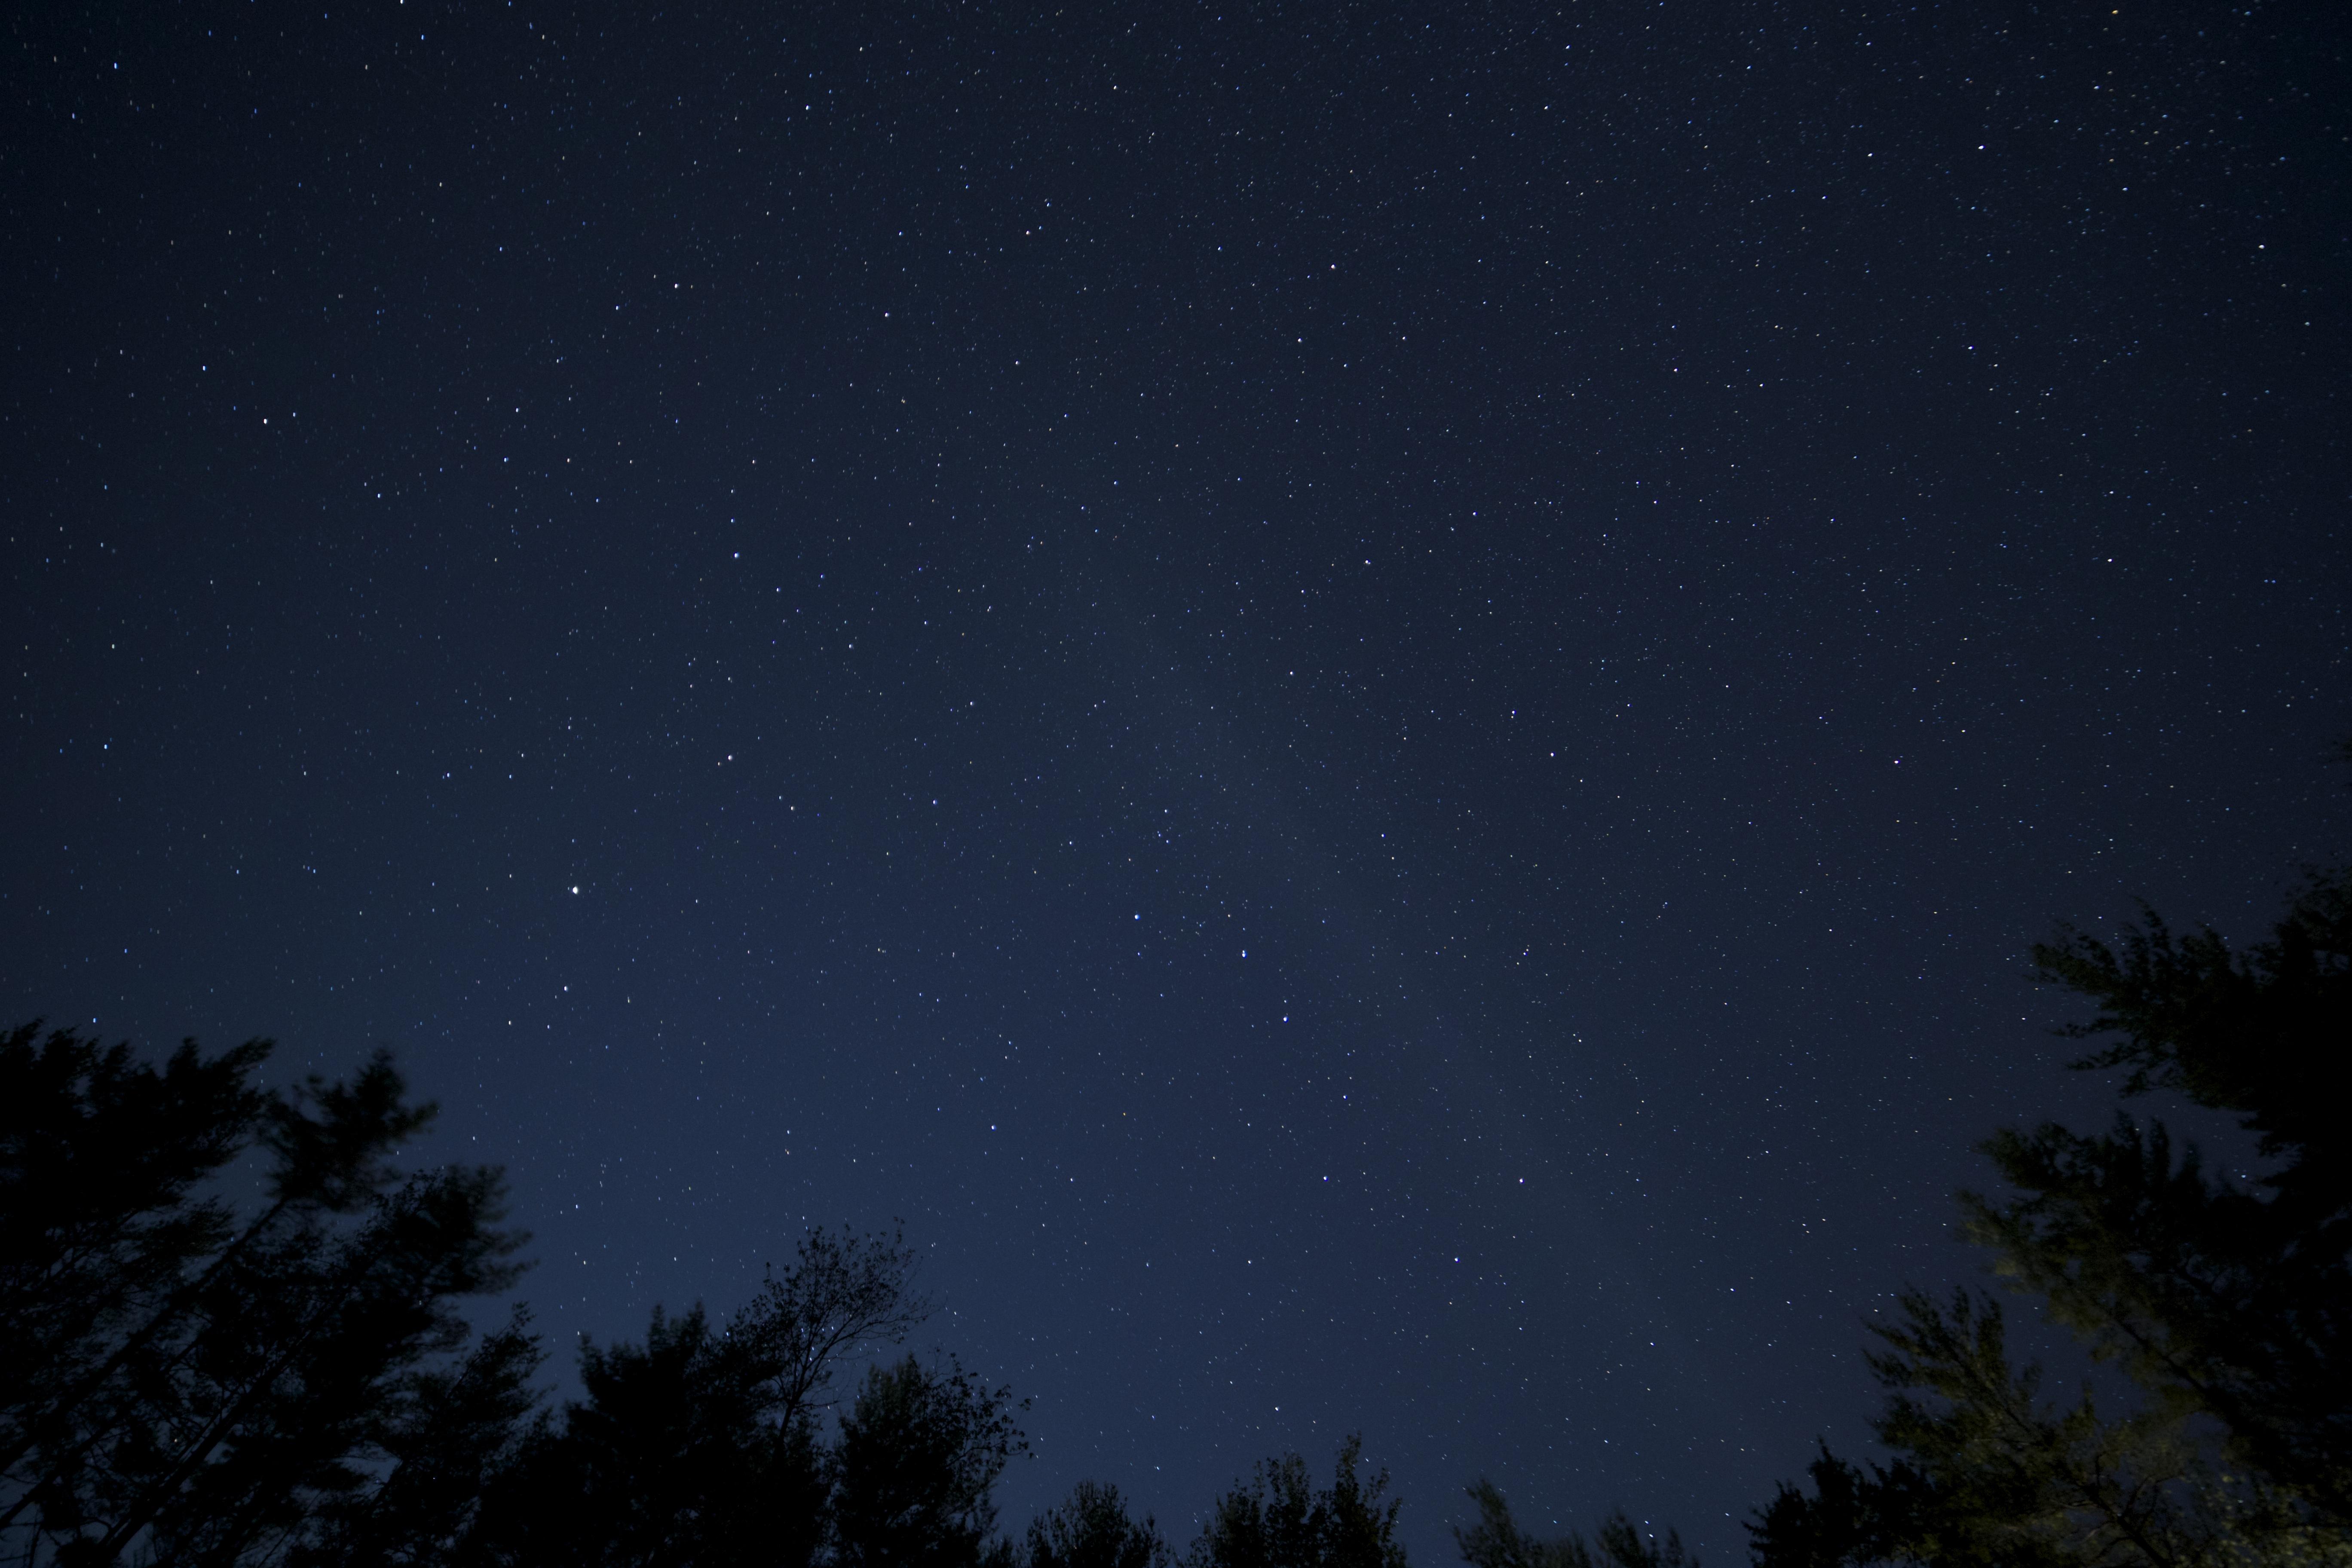 Gambar Langit Bintang Suasana Kegelapan Galaksi Fajar Sinar Bulan Tengah Malam Objek Astronomi Hitam Wallpaper 5472x3648 919248 Galeri Foto Pxhere